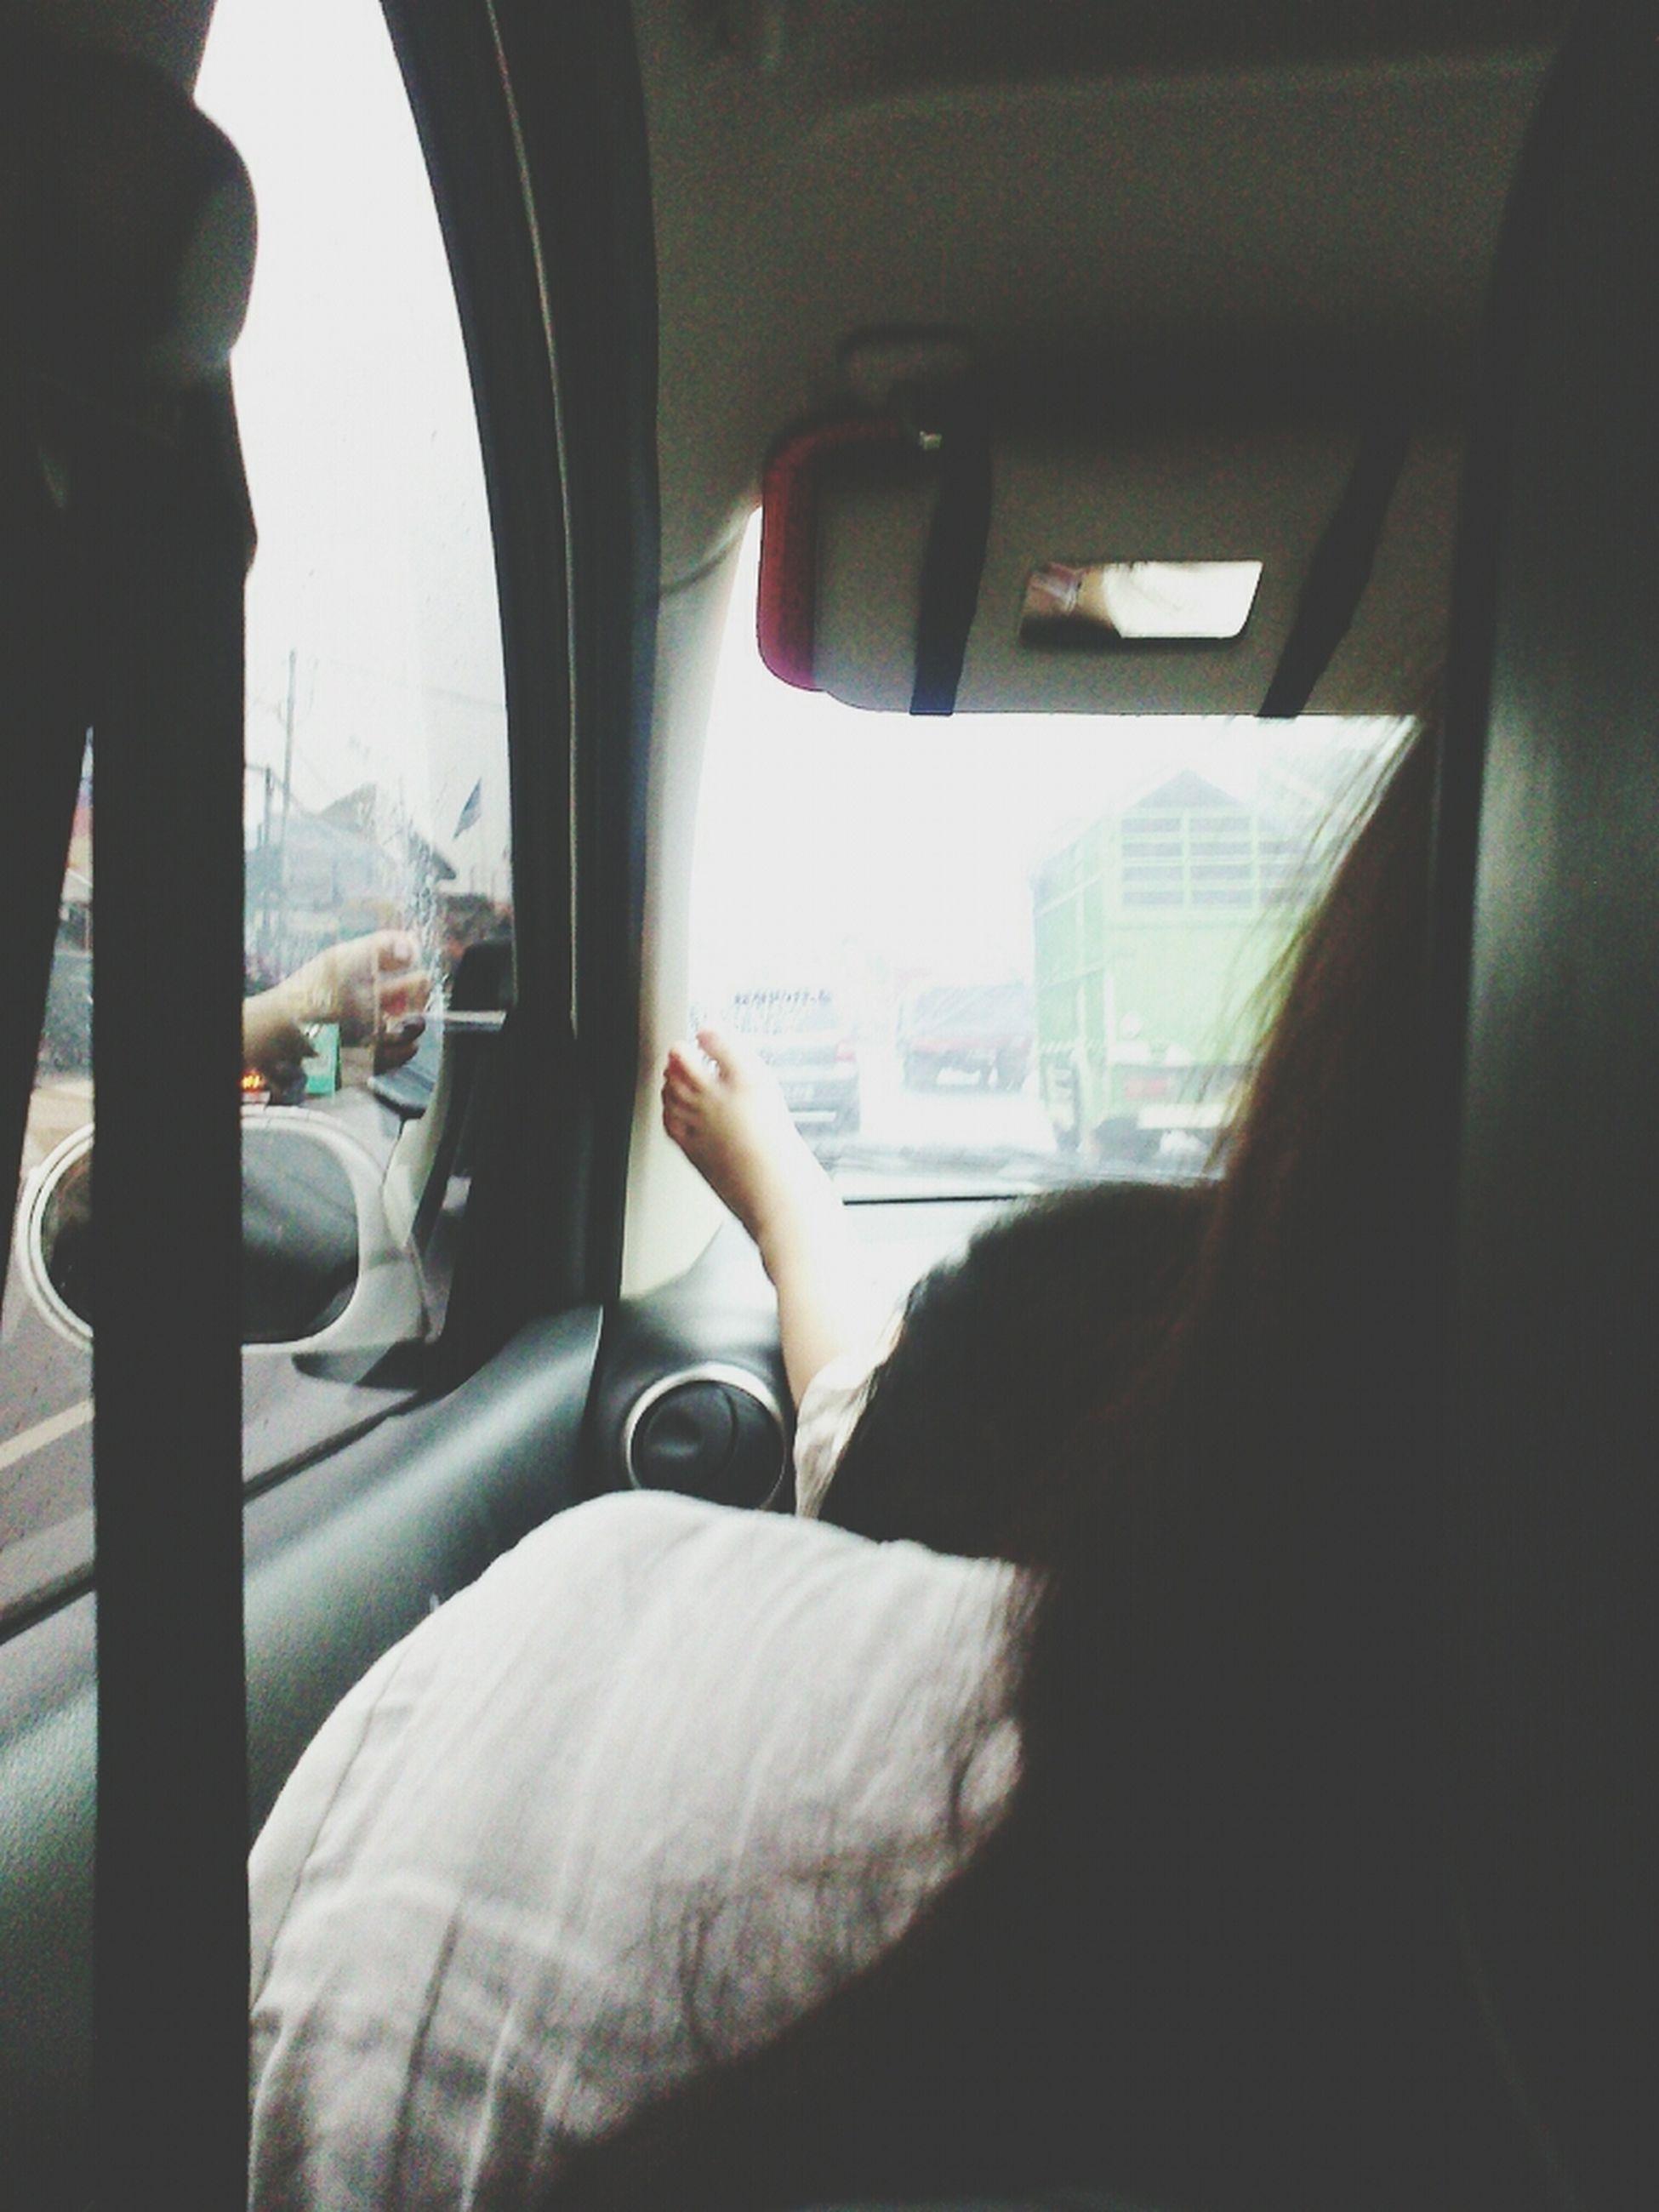 transportation, mode of transport, vehicle interior, land vehicle, car, window, indoors, travel, glass - material, lifestyles, transparent, car interior, public transportation, vehicle seat, leisure activity, men, sitting, journey